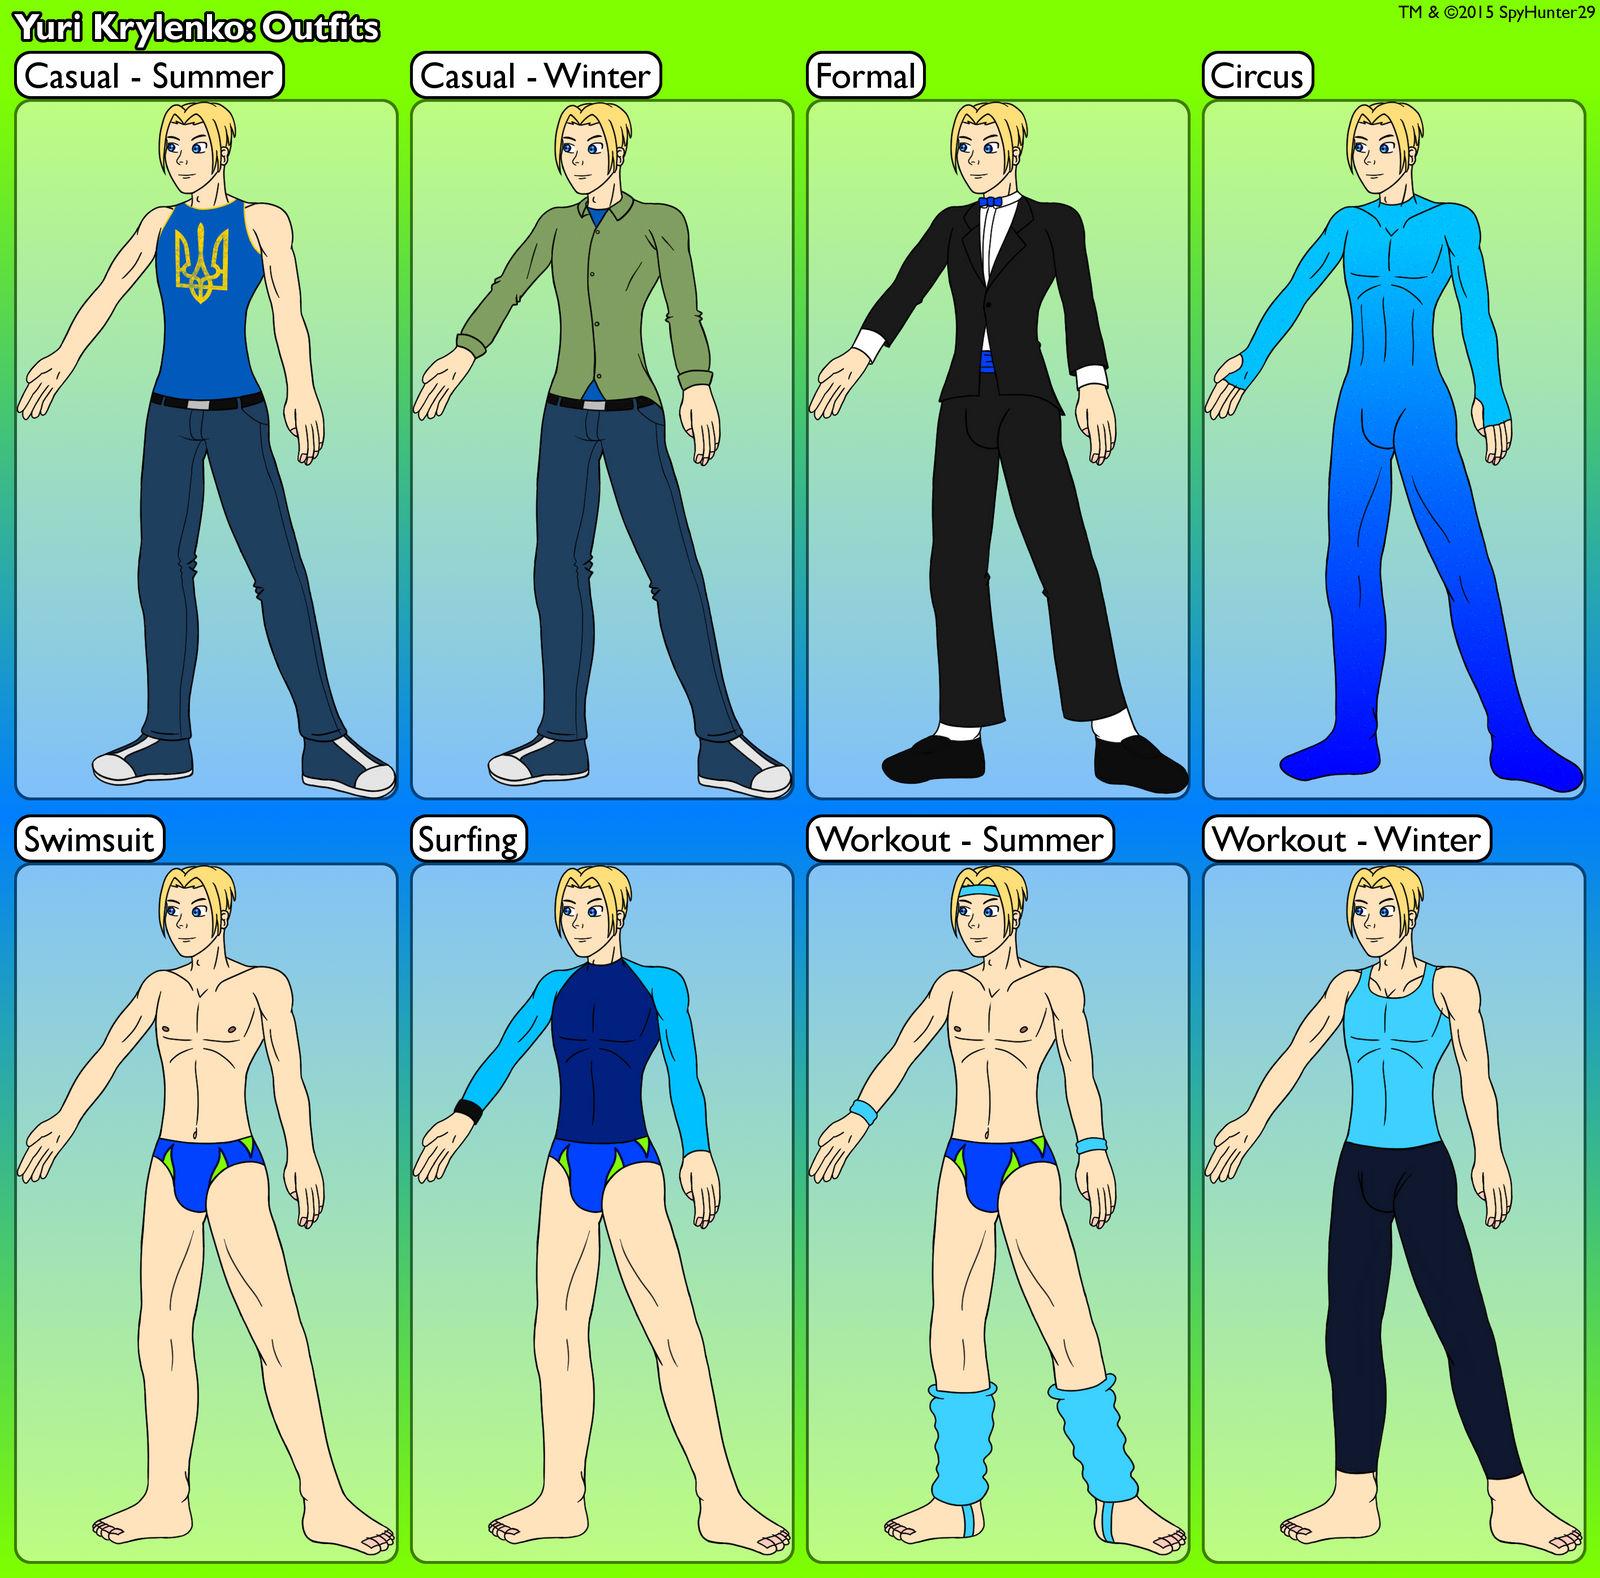 Yuri Krylenko Outfits